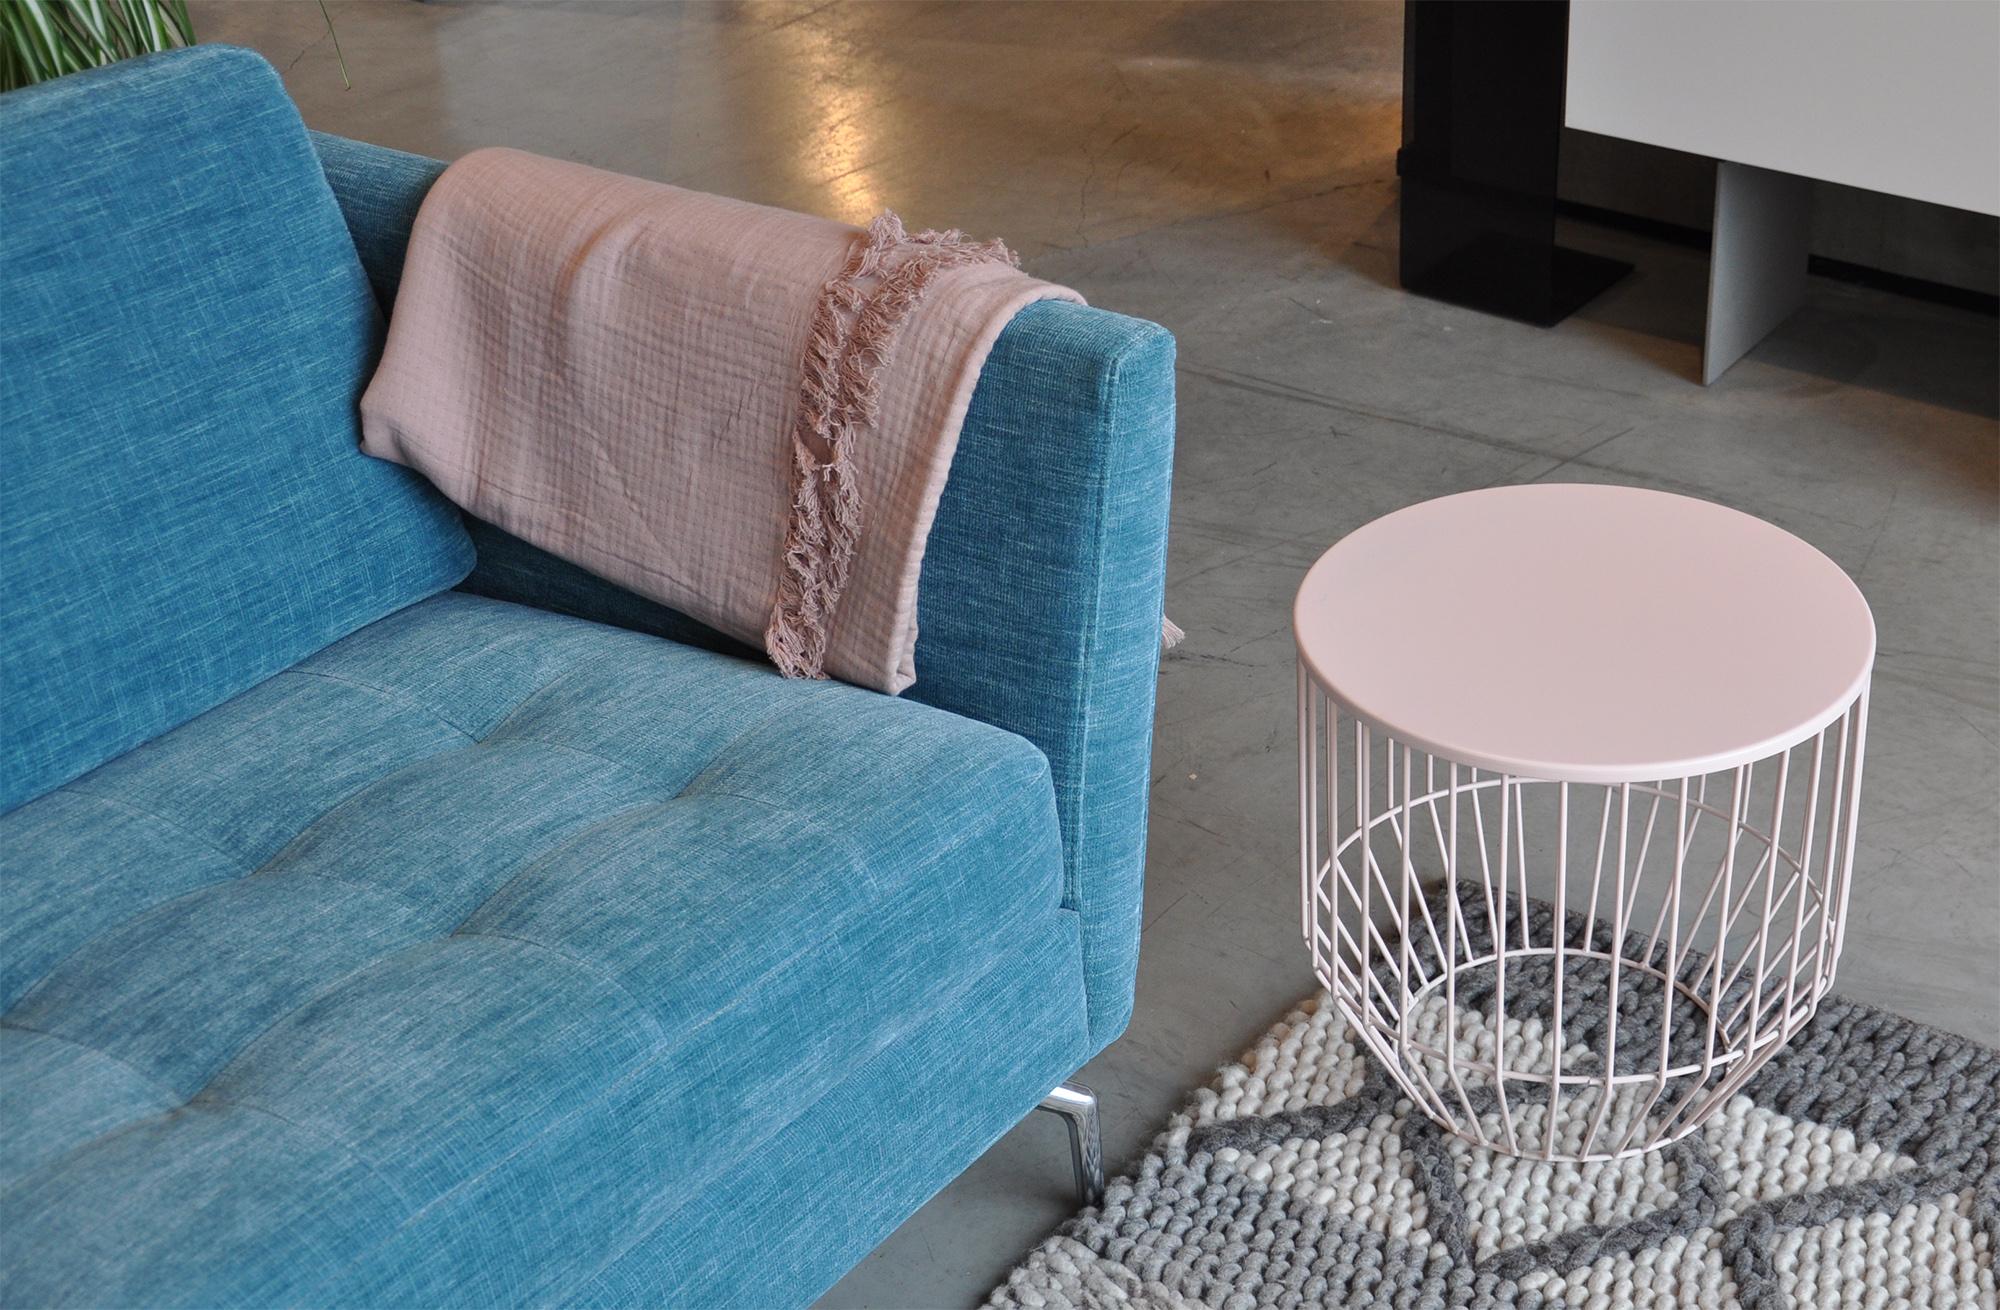 Osaka sofa  in turquoise Napoli fabric,  Palencia rug ,  Wire stool  in matt pink.